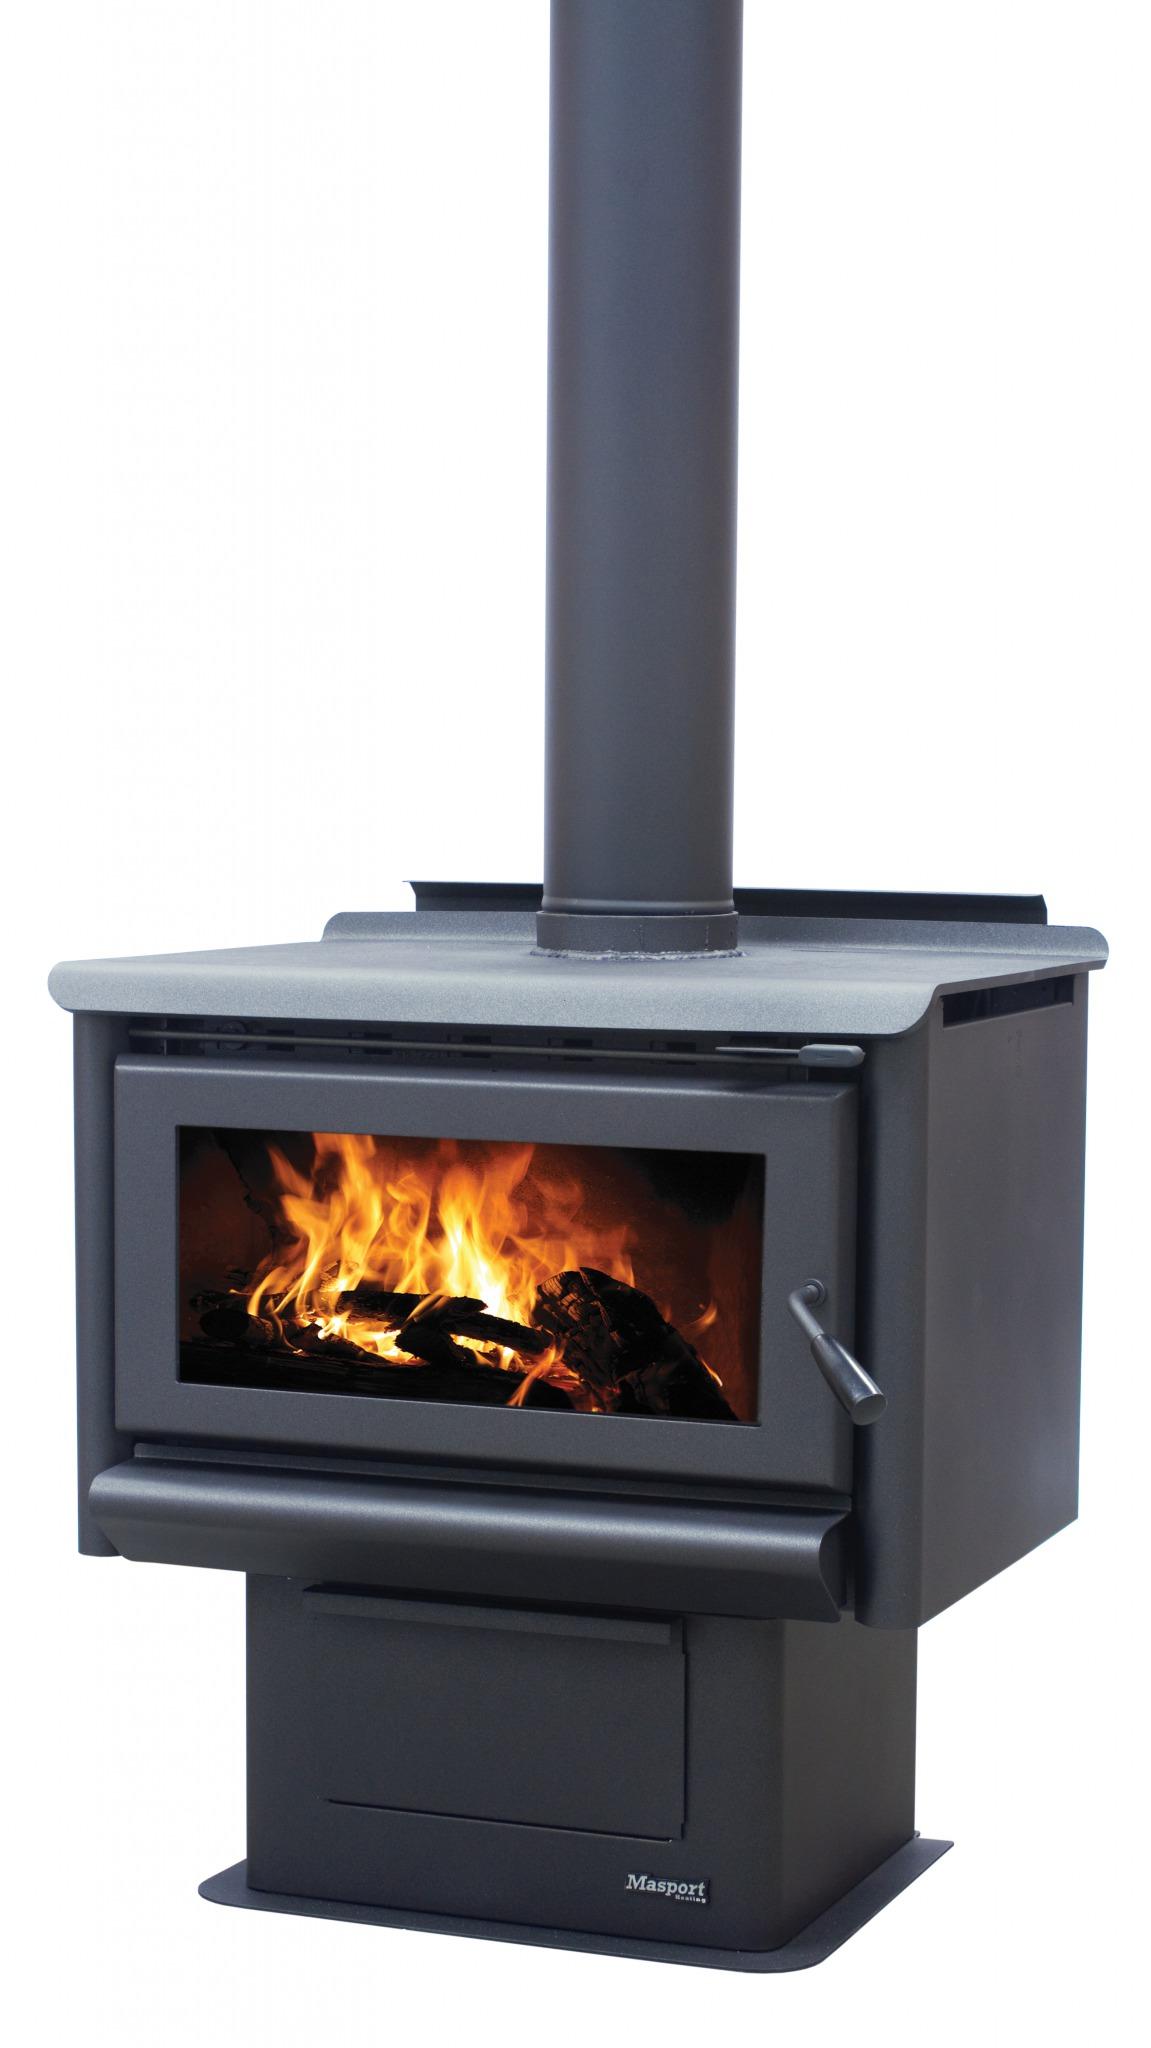 MASPORT R5000 – Freestanding Radiant Wood Burner With Ash Pan